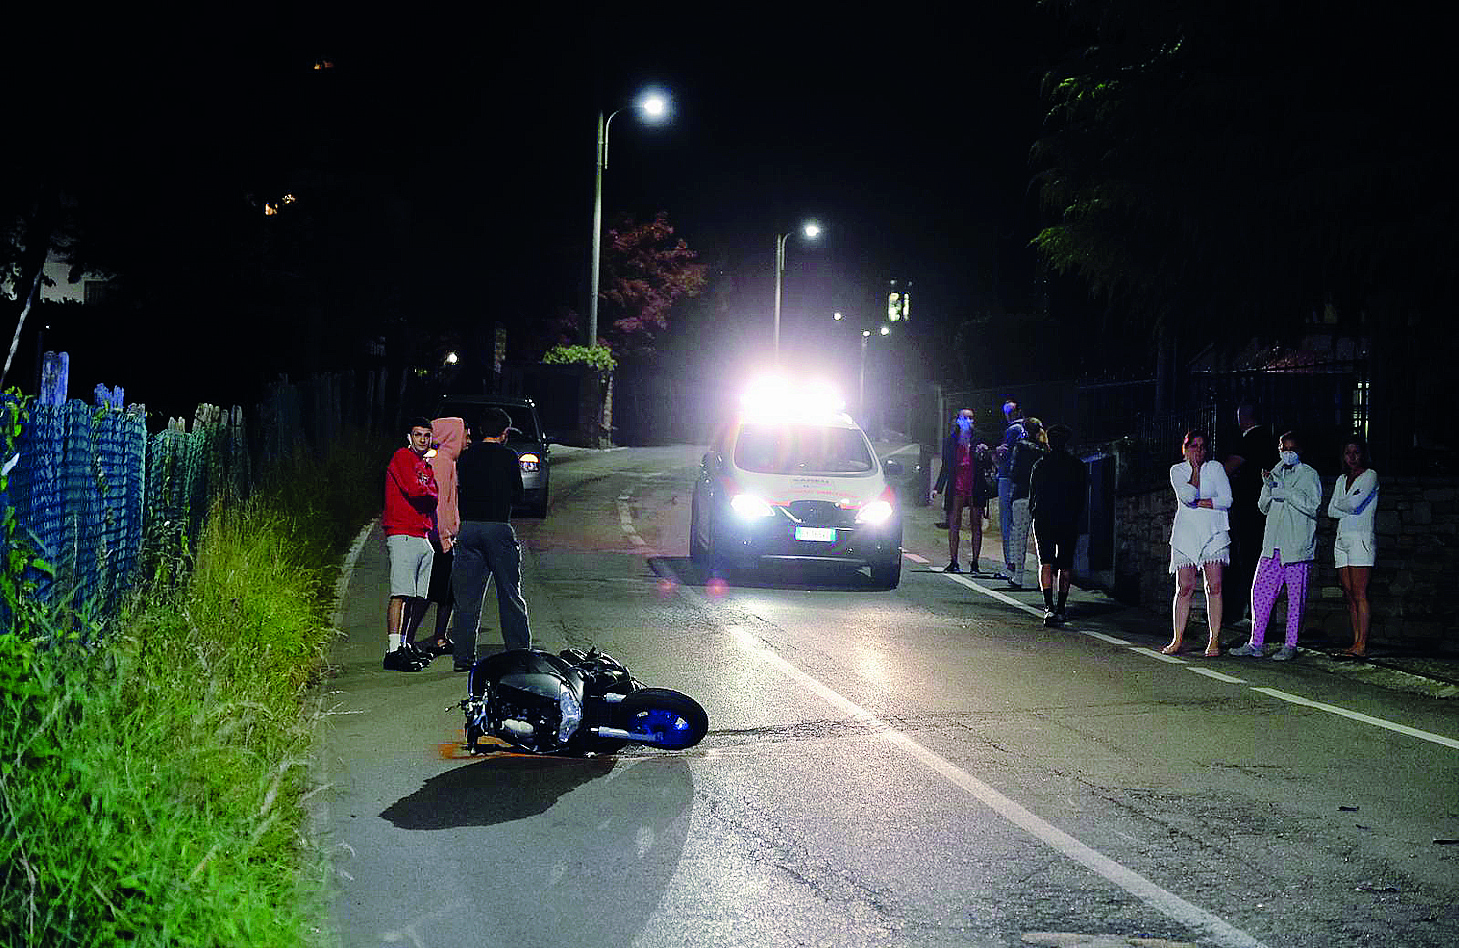 La moto sulla quale viaggiava l'uomo deceduto